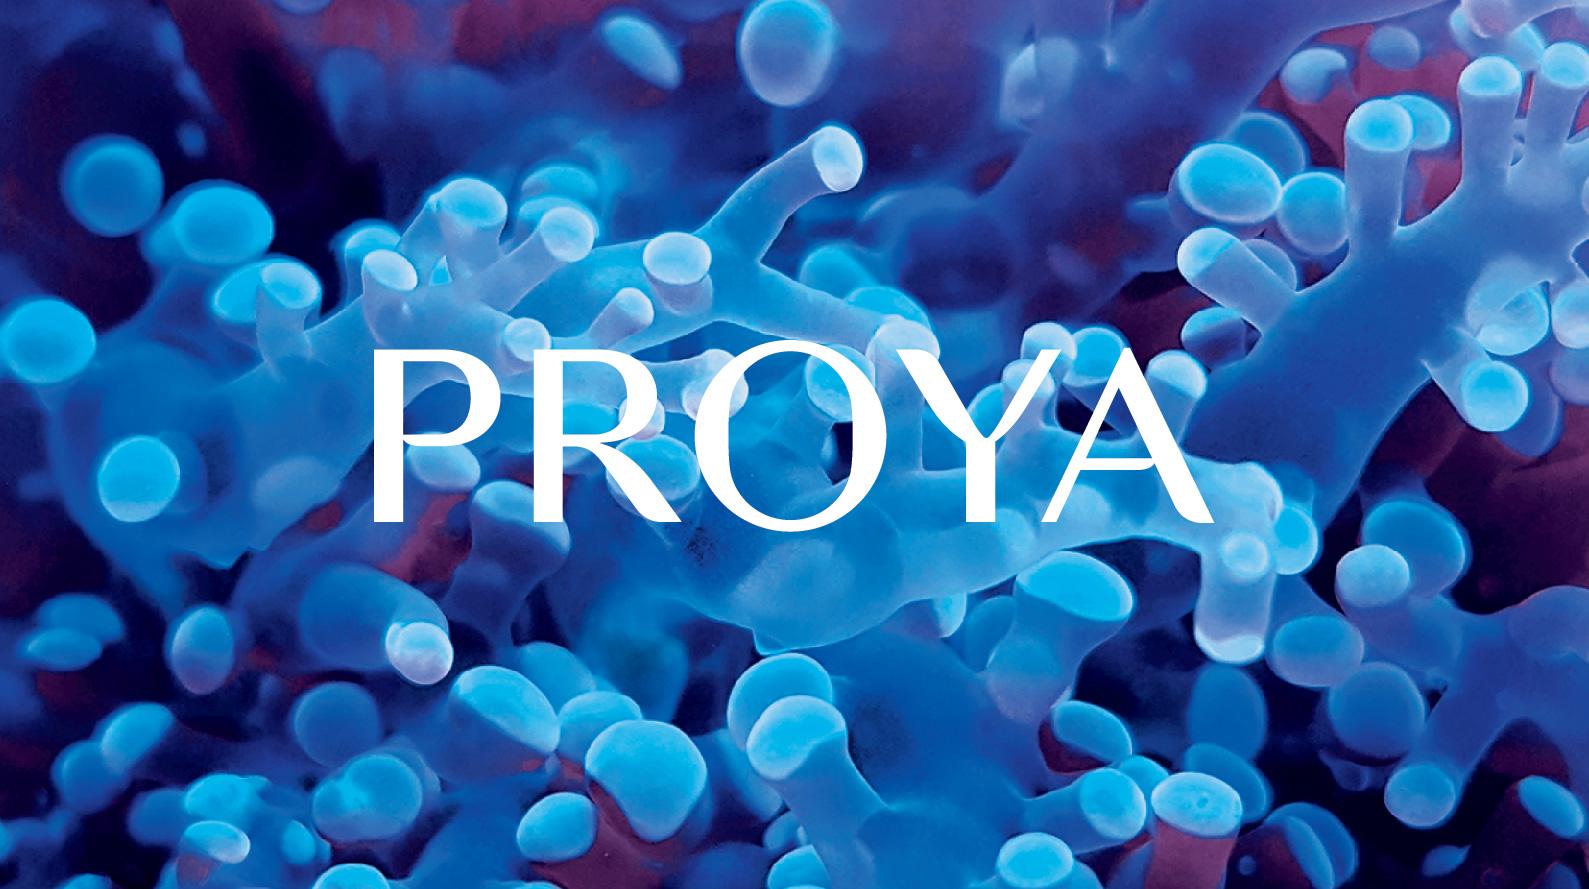 proya_00-5.jpg